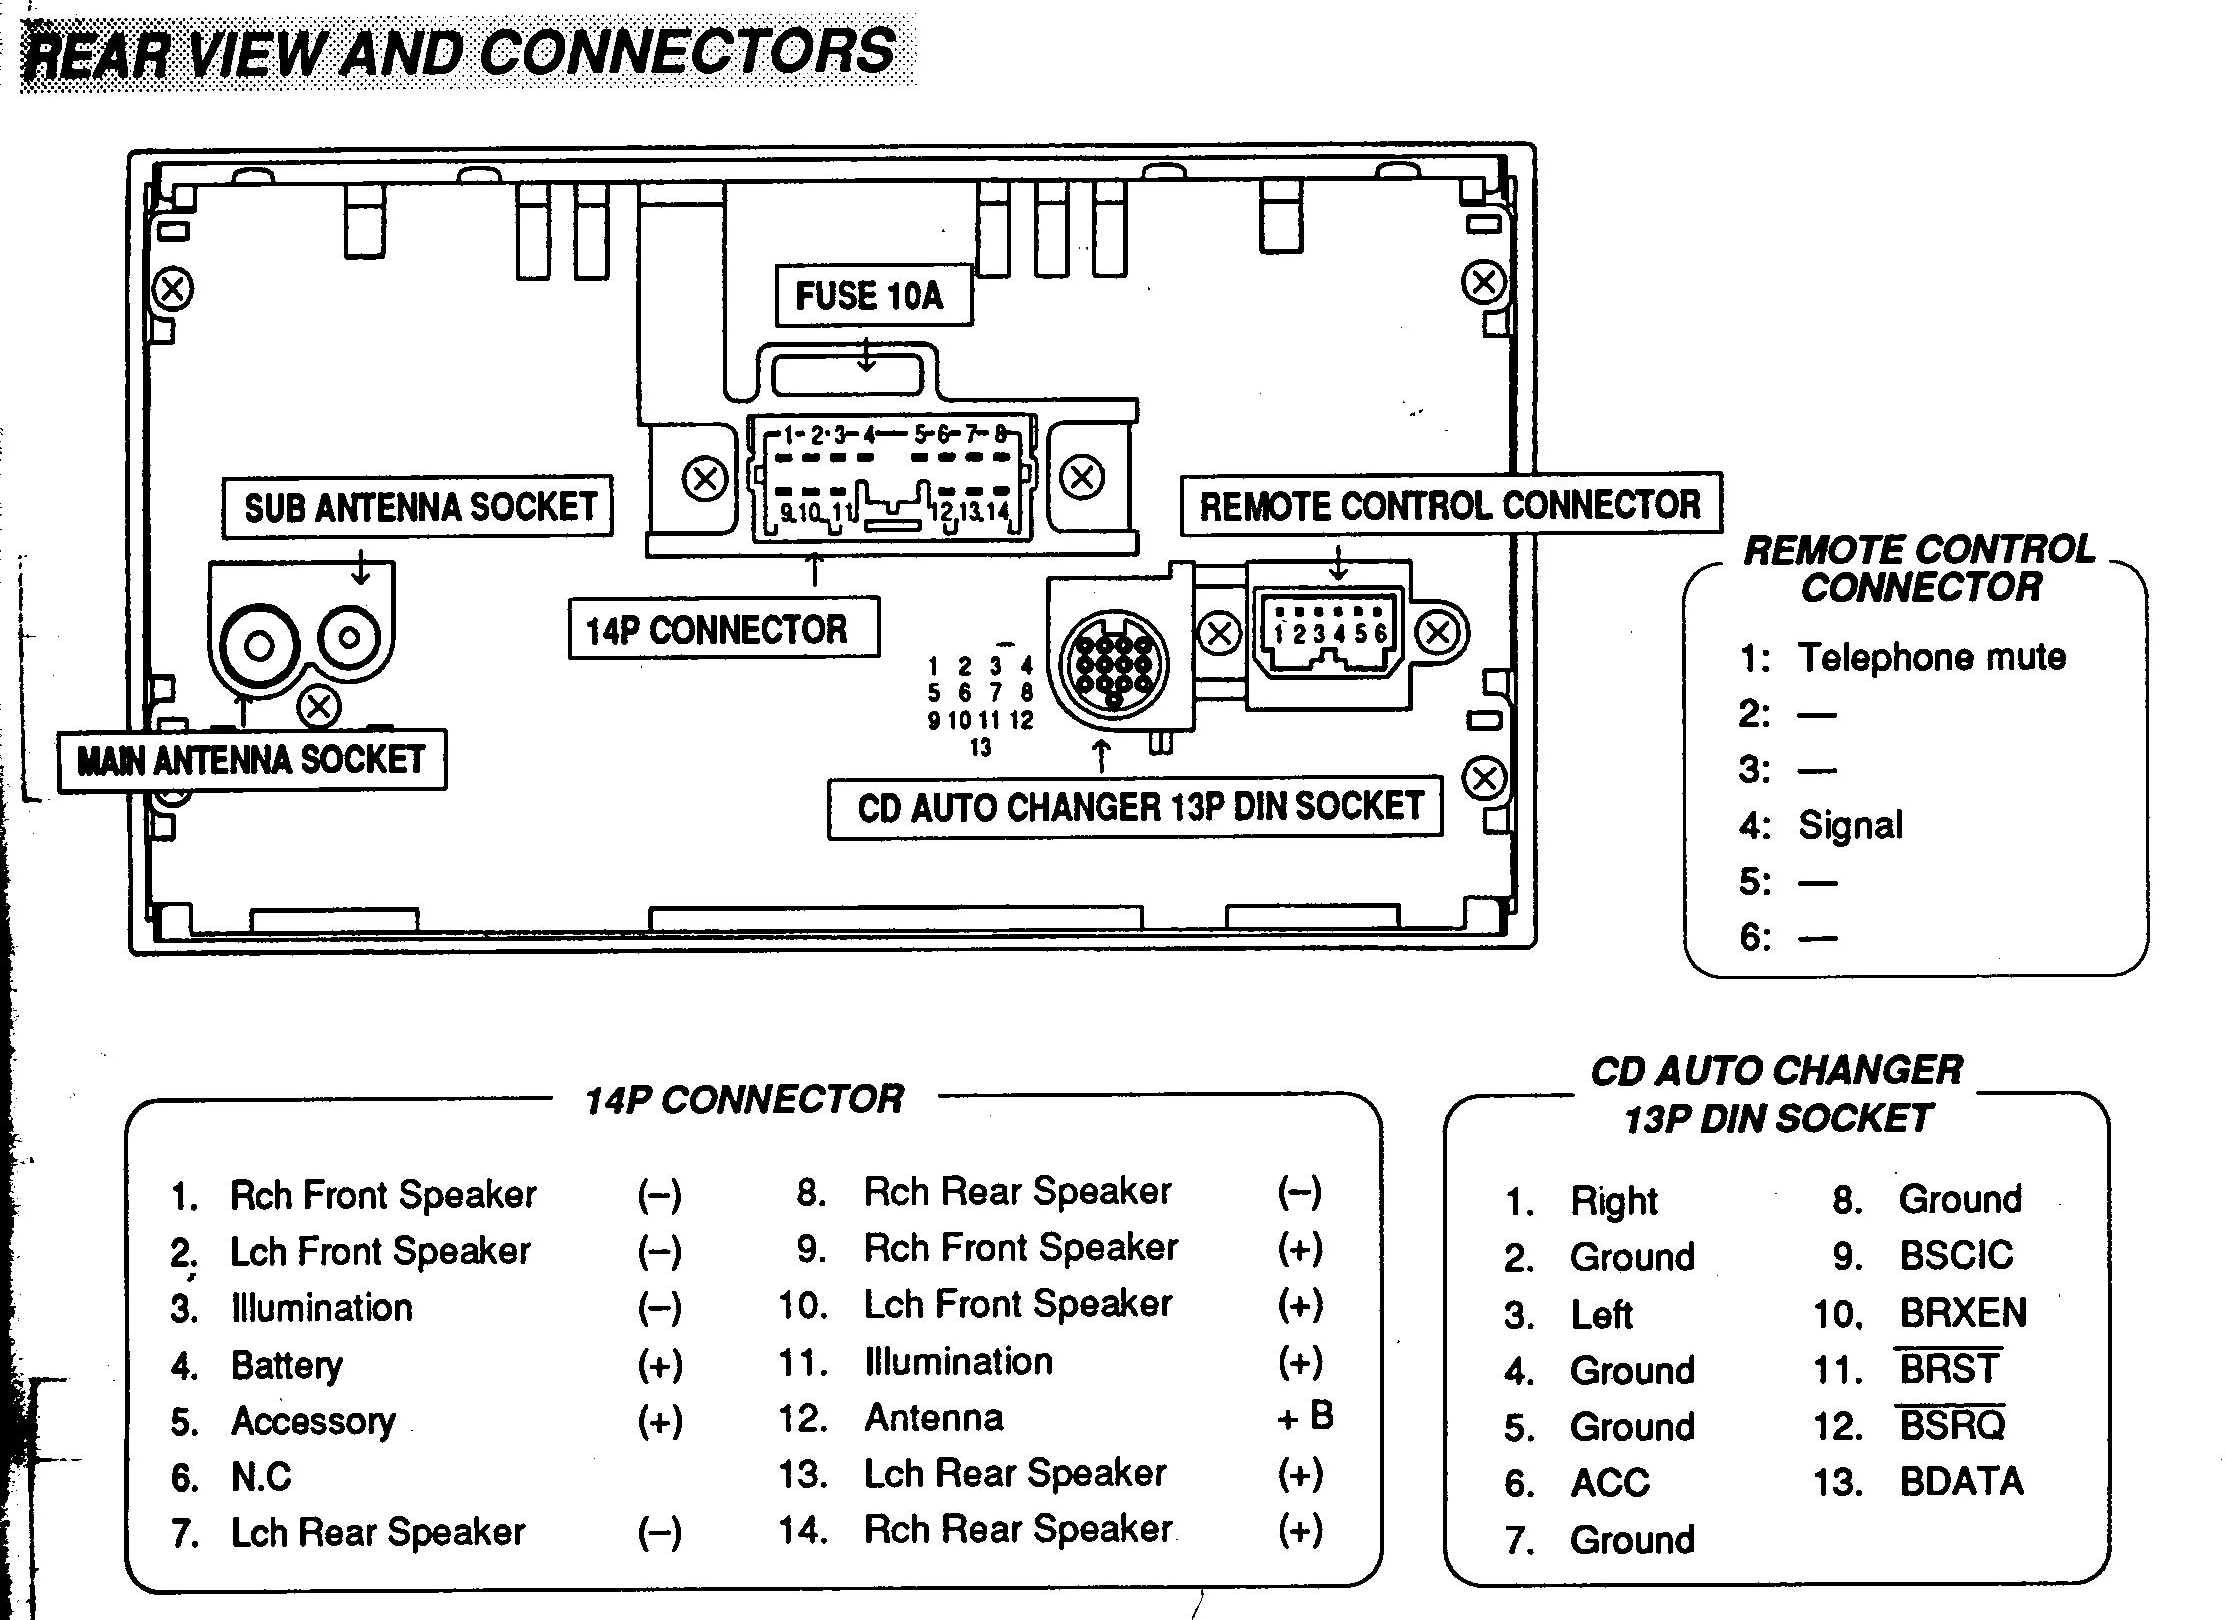 2005 mitsubishi outlander radio wiring - wiring diagram engine doug-base -  doug-base.unapadellaperdue.it  unapadellaperdue.it